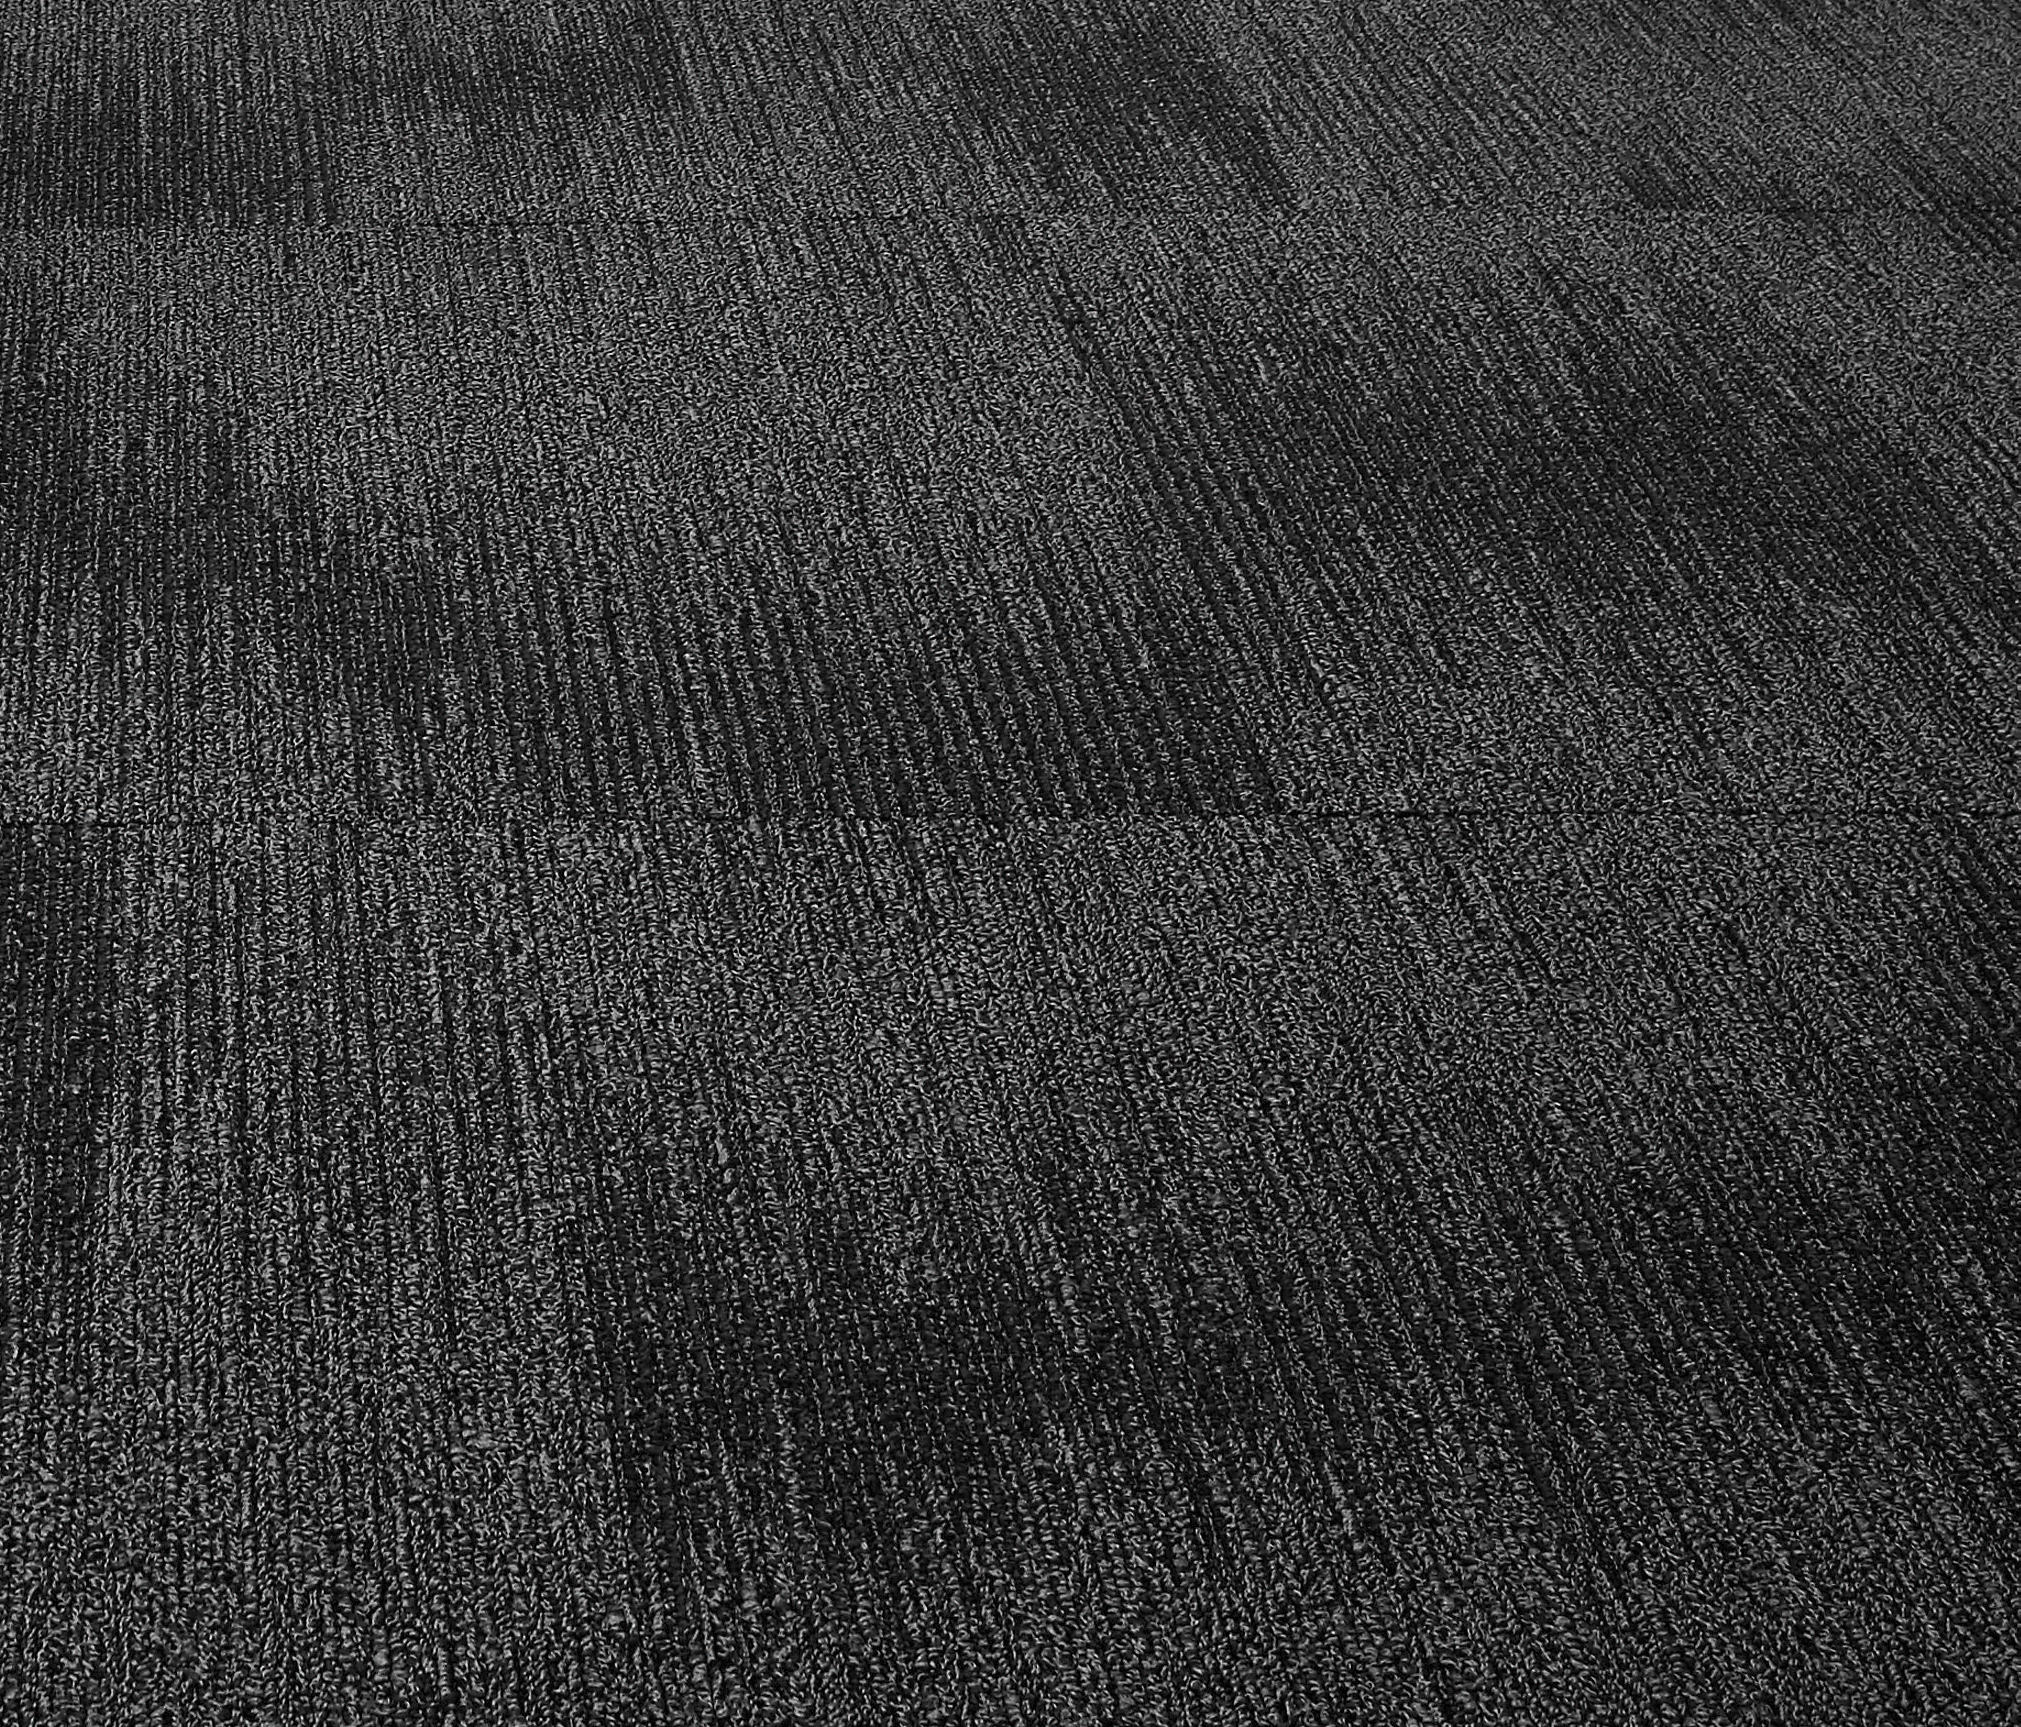 Disruptor Carpet Tiles From Bentley Mills Architonic